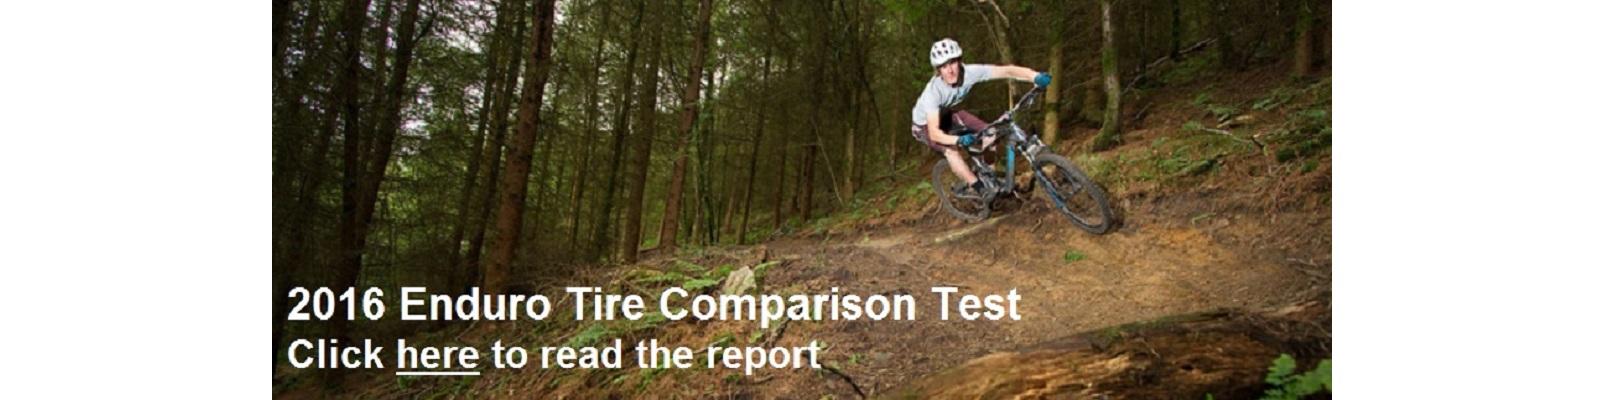 2016 Enduro Tire Test Report2.jpg